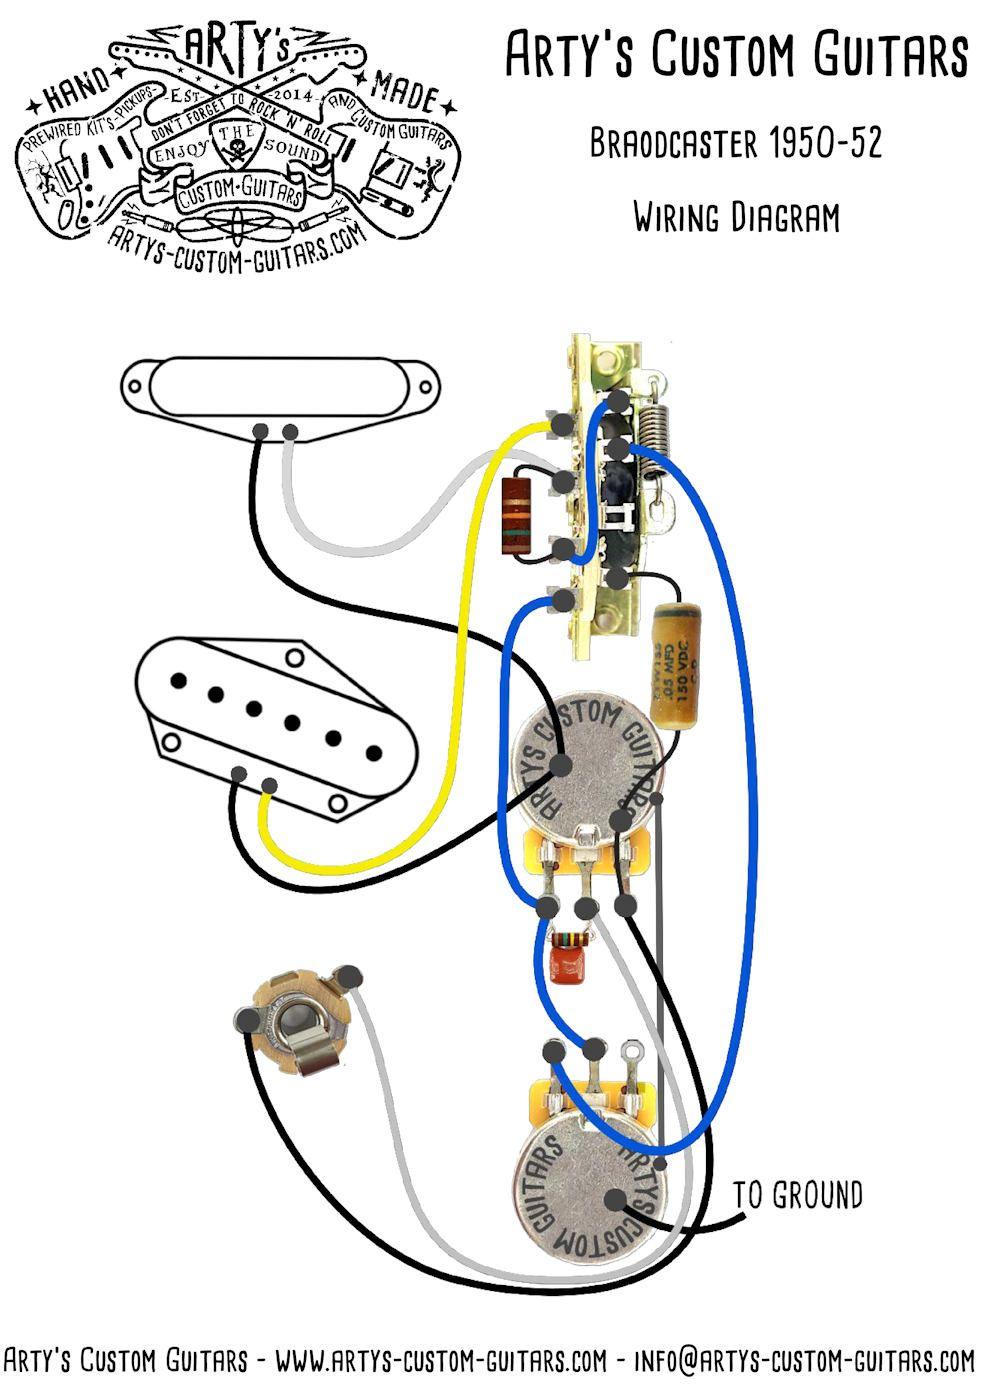 Fender Telecaster Wiring Diagram And Magenets 1977 Dodge D350 Wiring Diagram Rc85wirings Tukune Jeanjaures37 Fr